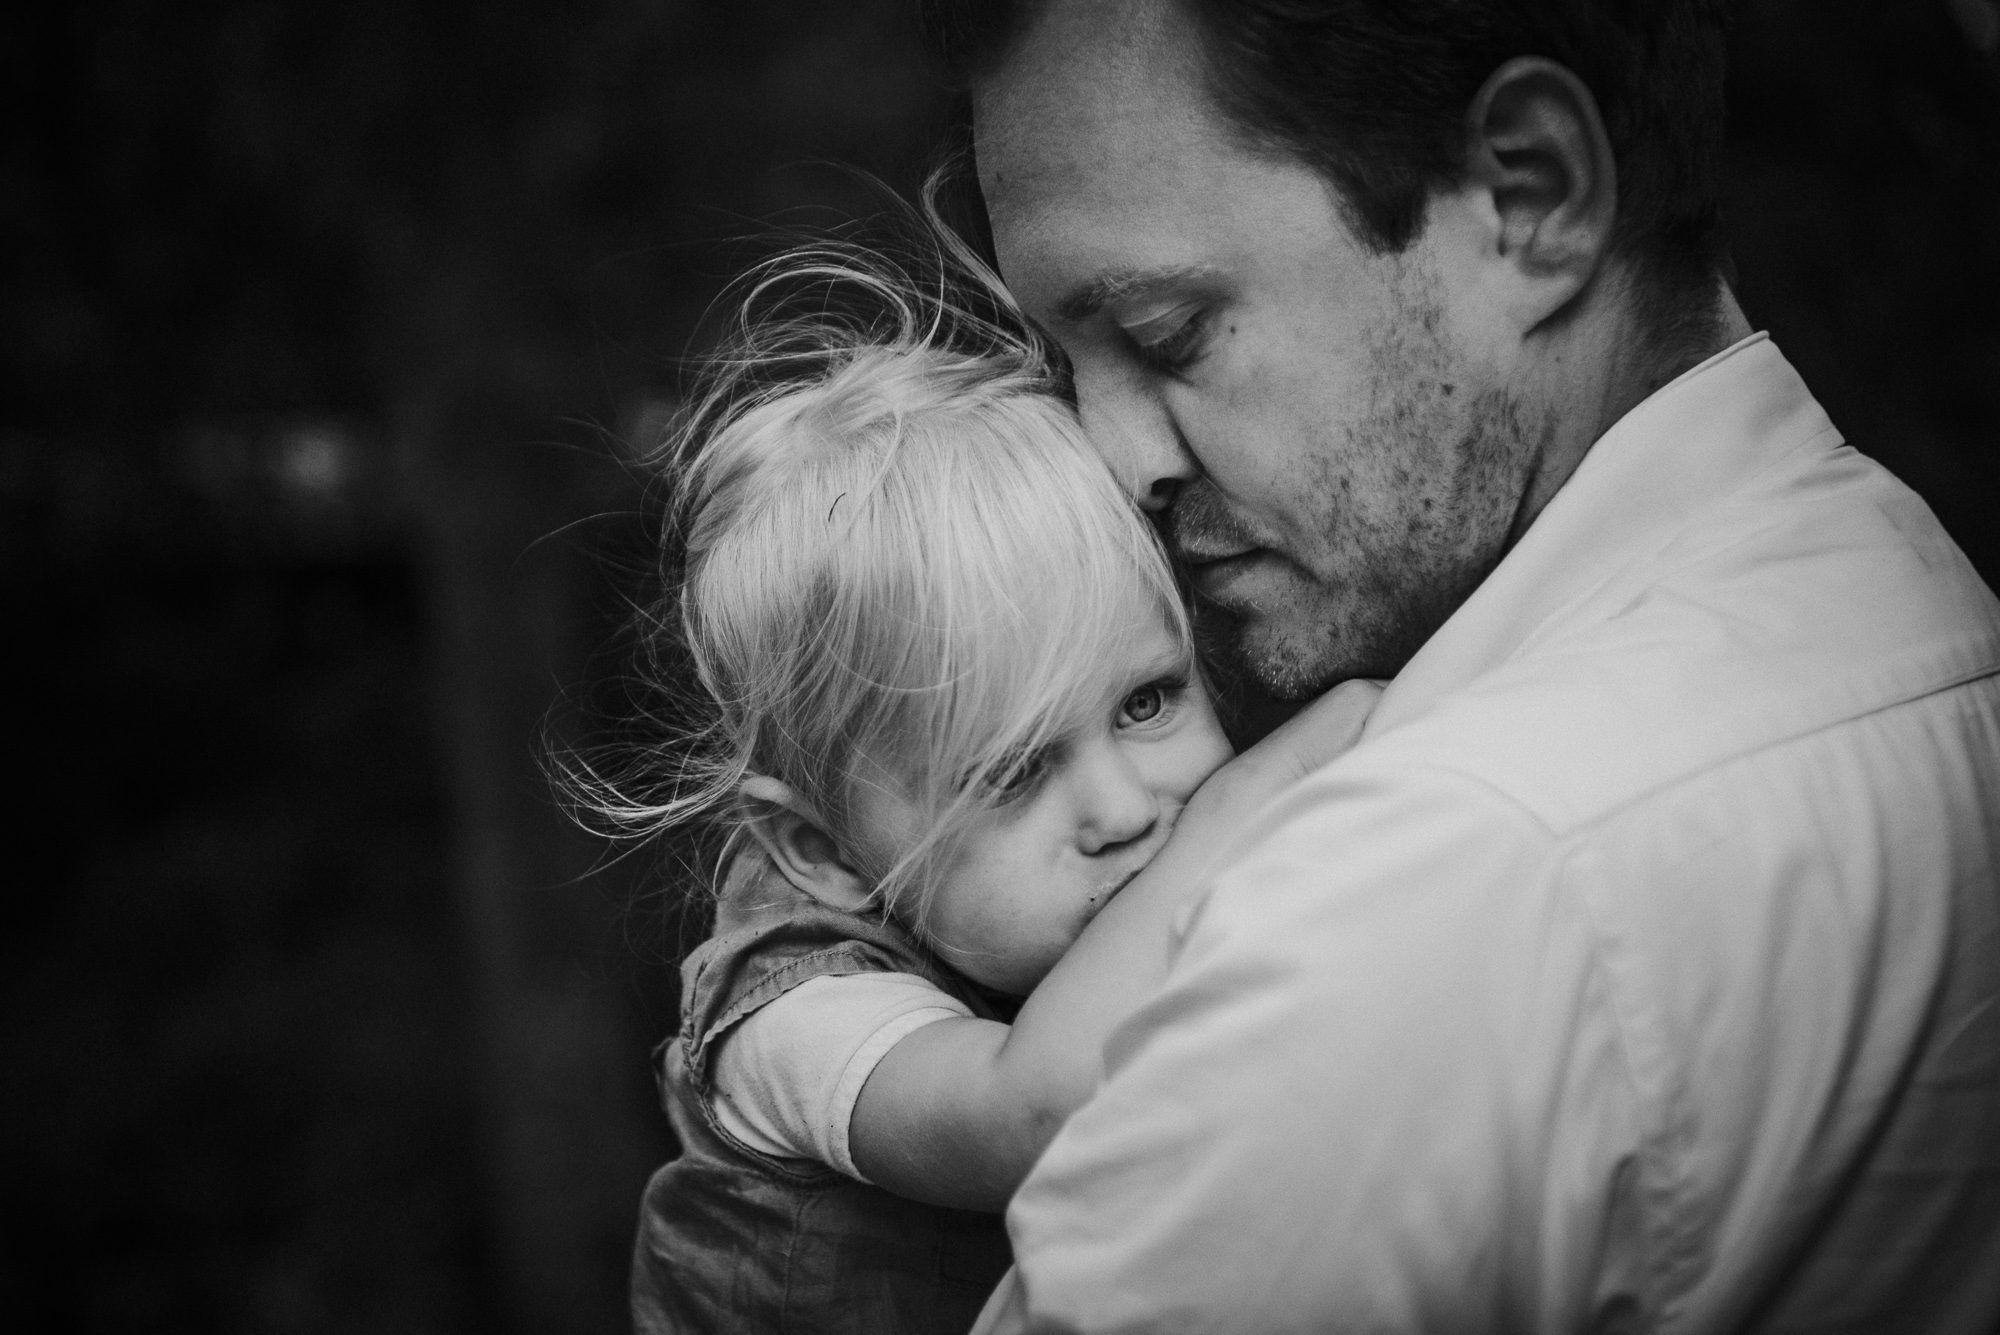 gezinsfotograaf fotoshoot Rosmalen